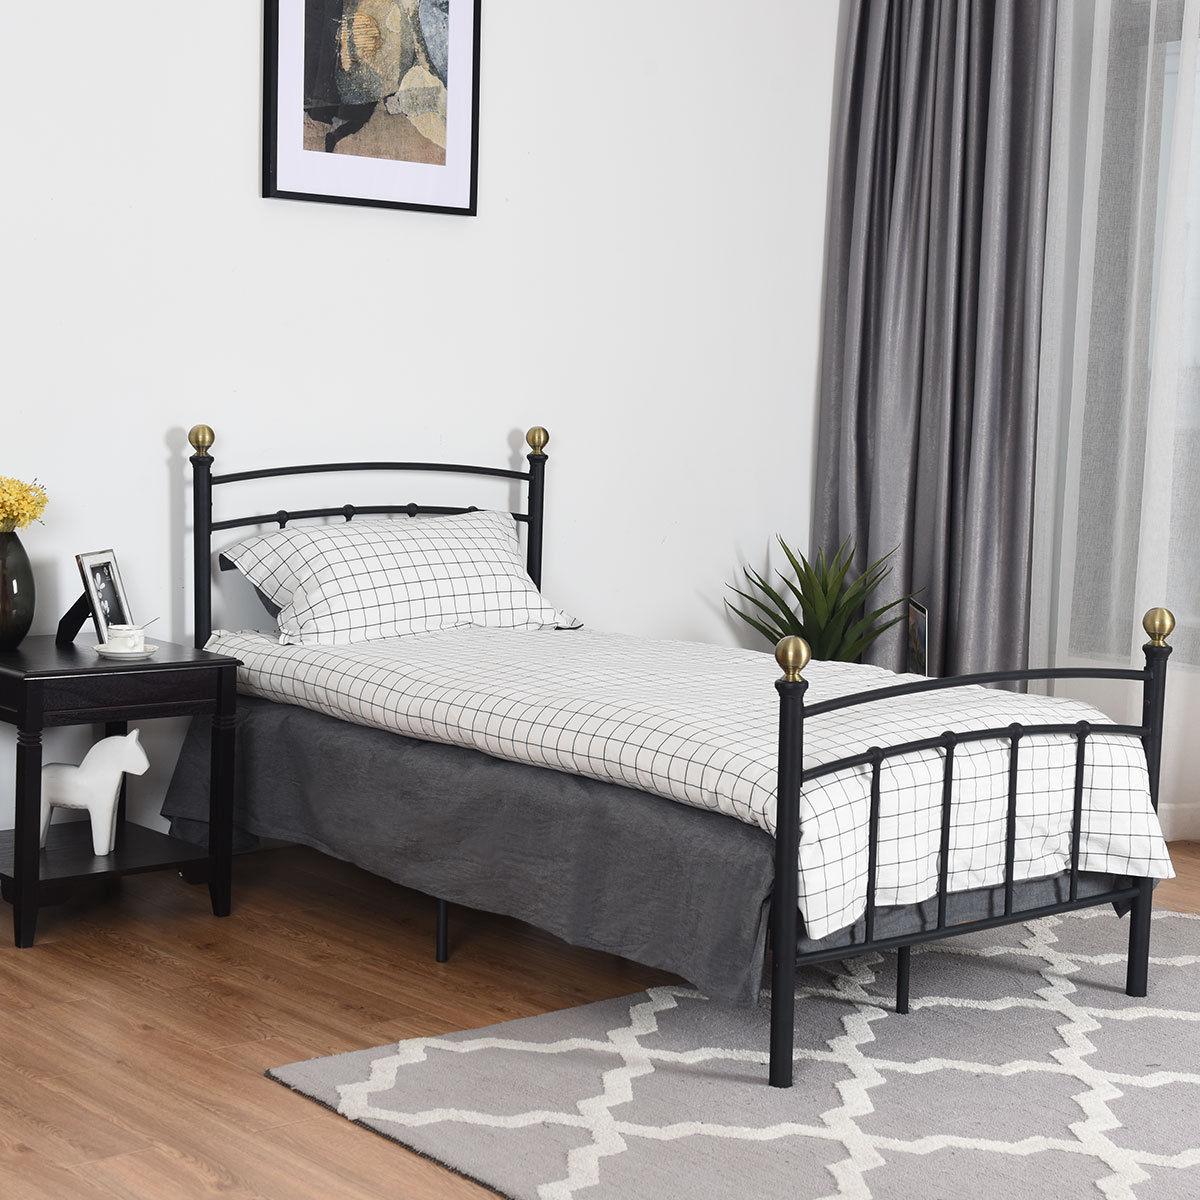 "Costway 12"" Twin Size Metal Bed Frame Platform Metal Slat Support Headboard Footboard"